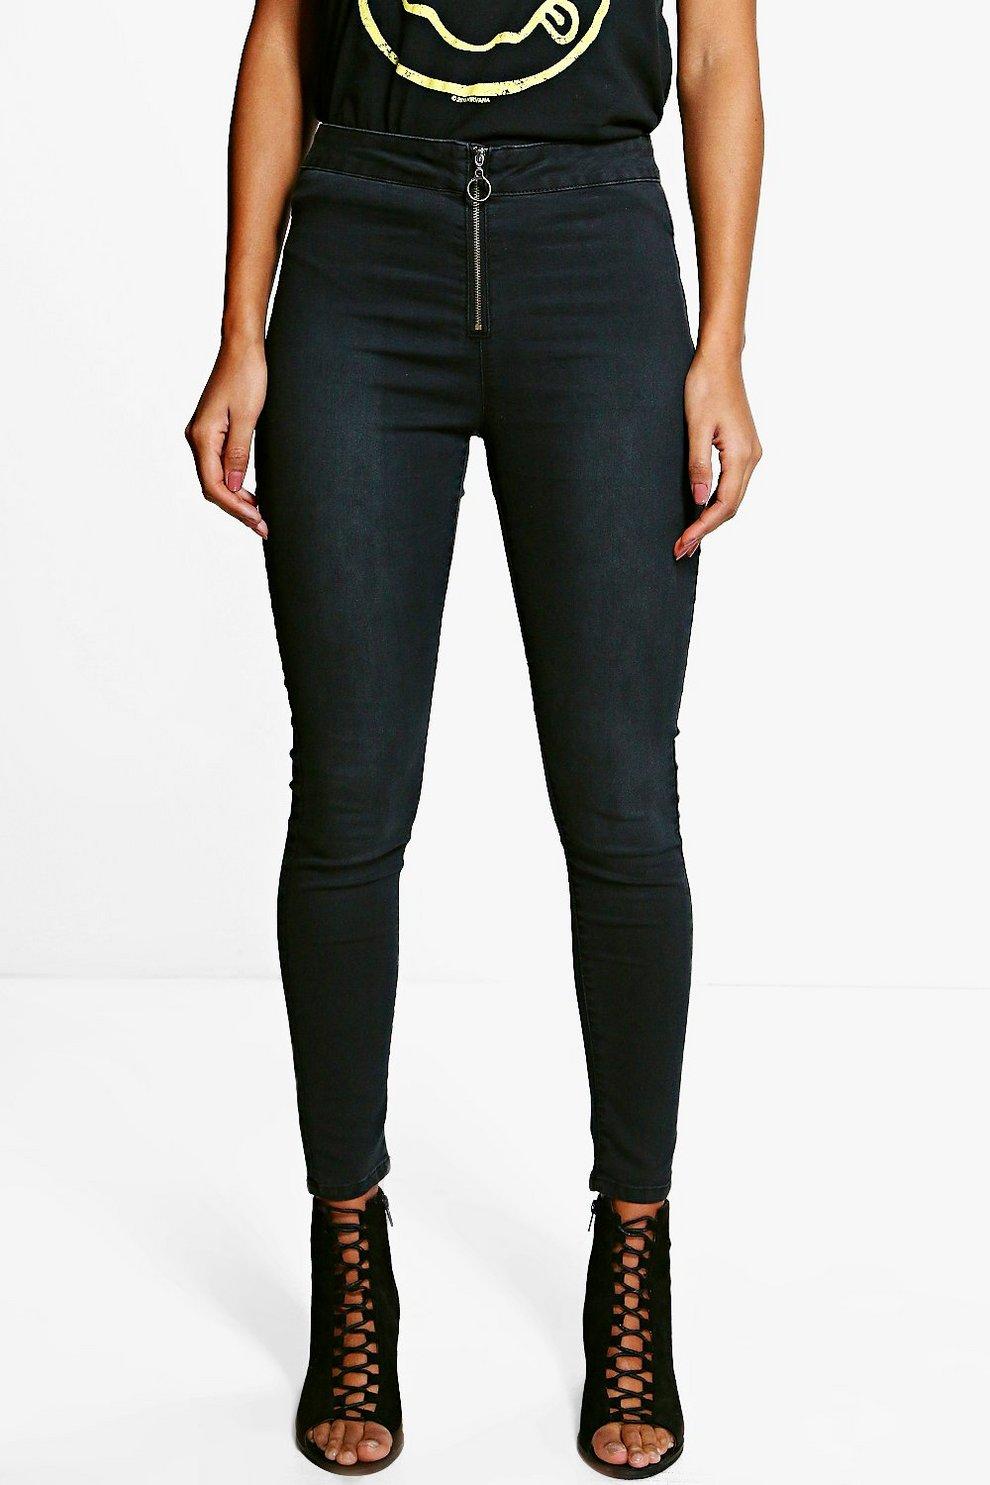 Womens Multi-Zip Skinny Jeans Boohoo DbPS6bpDh